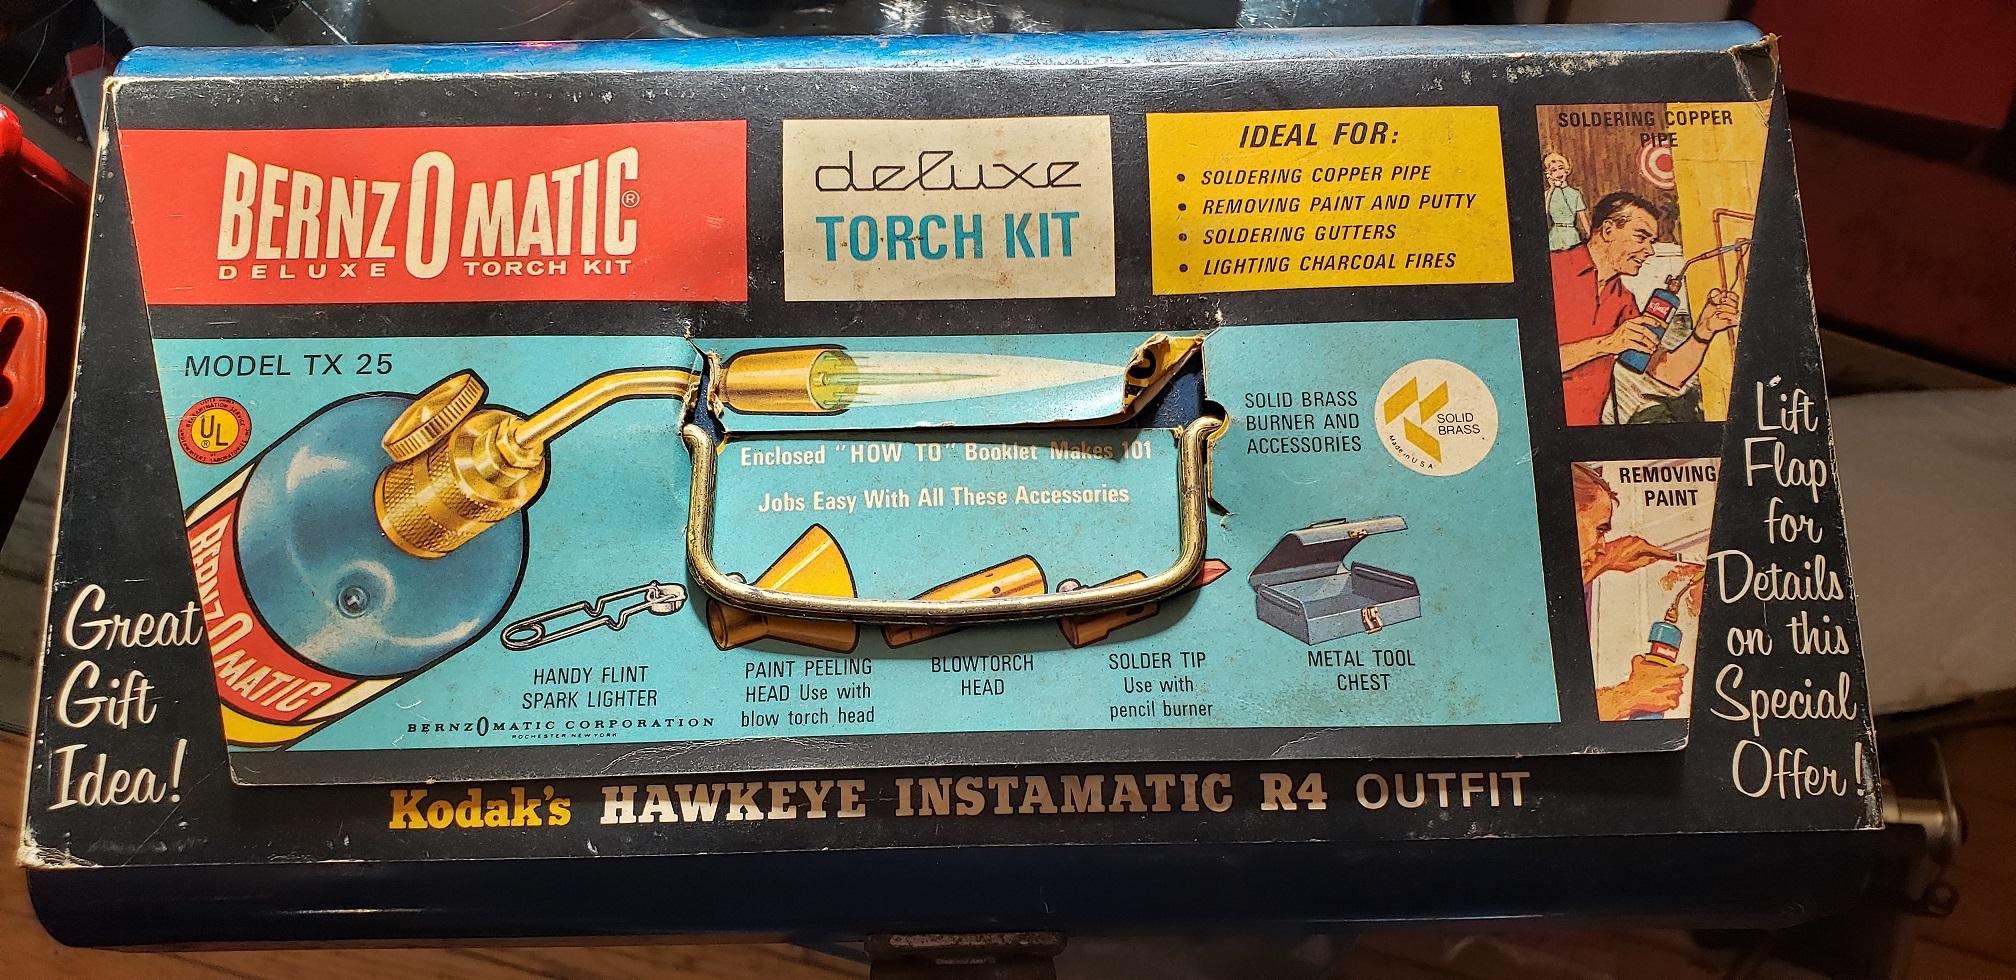 1967 Bernzomatic torch kit.jpg